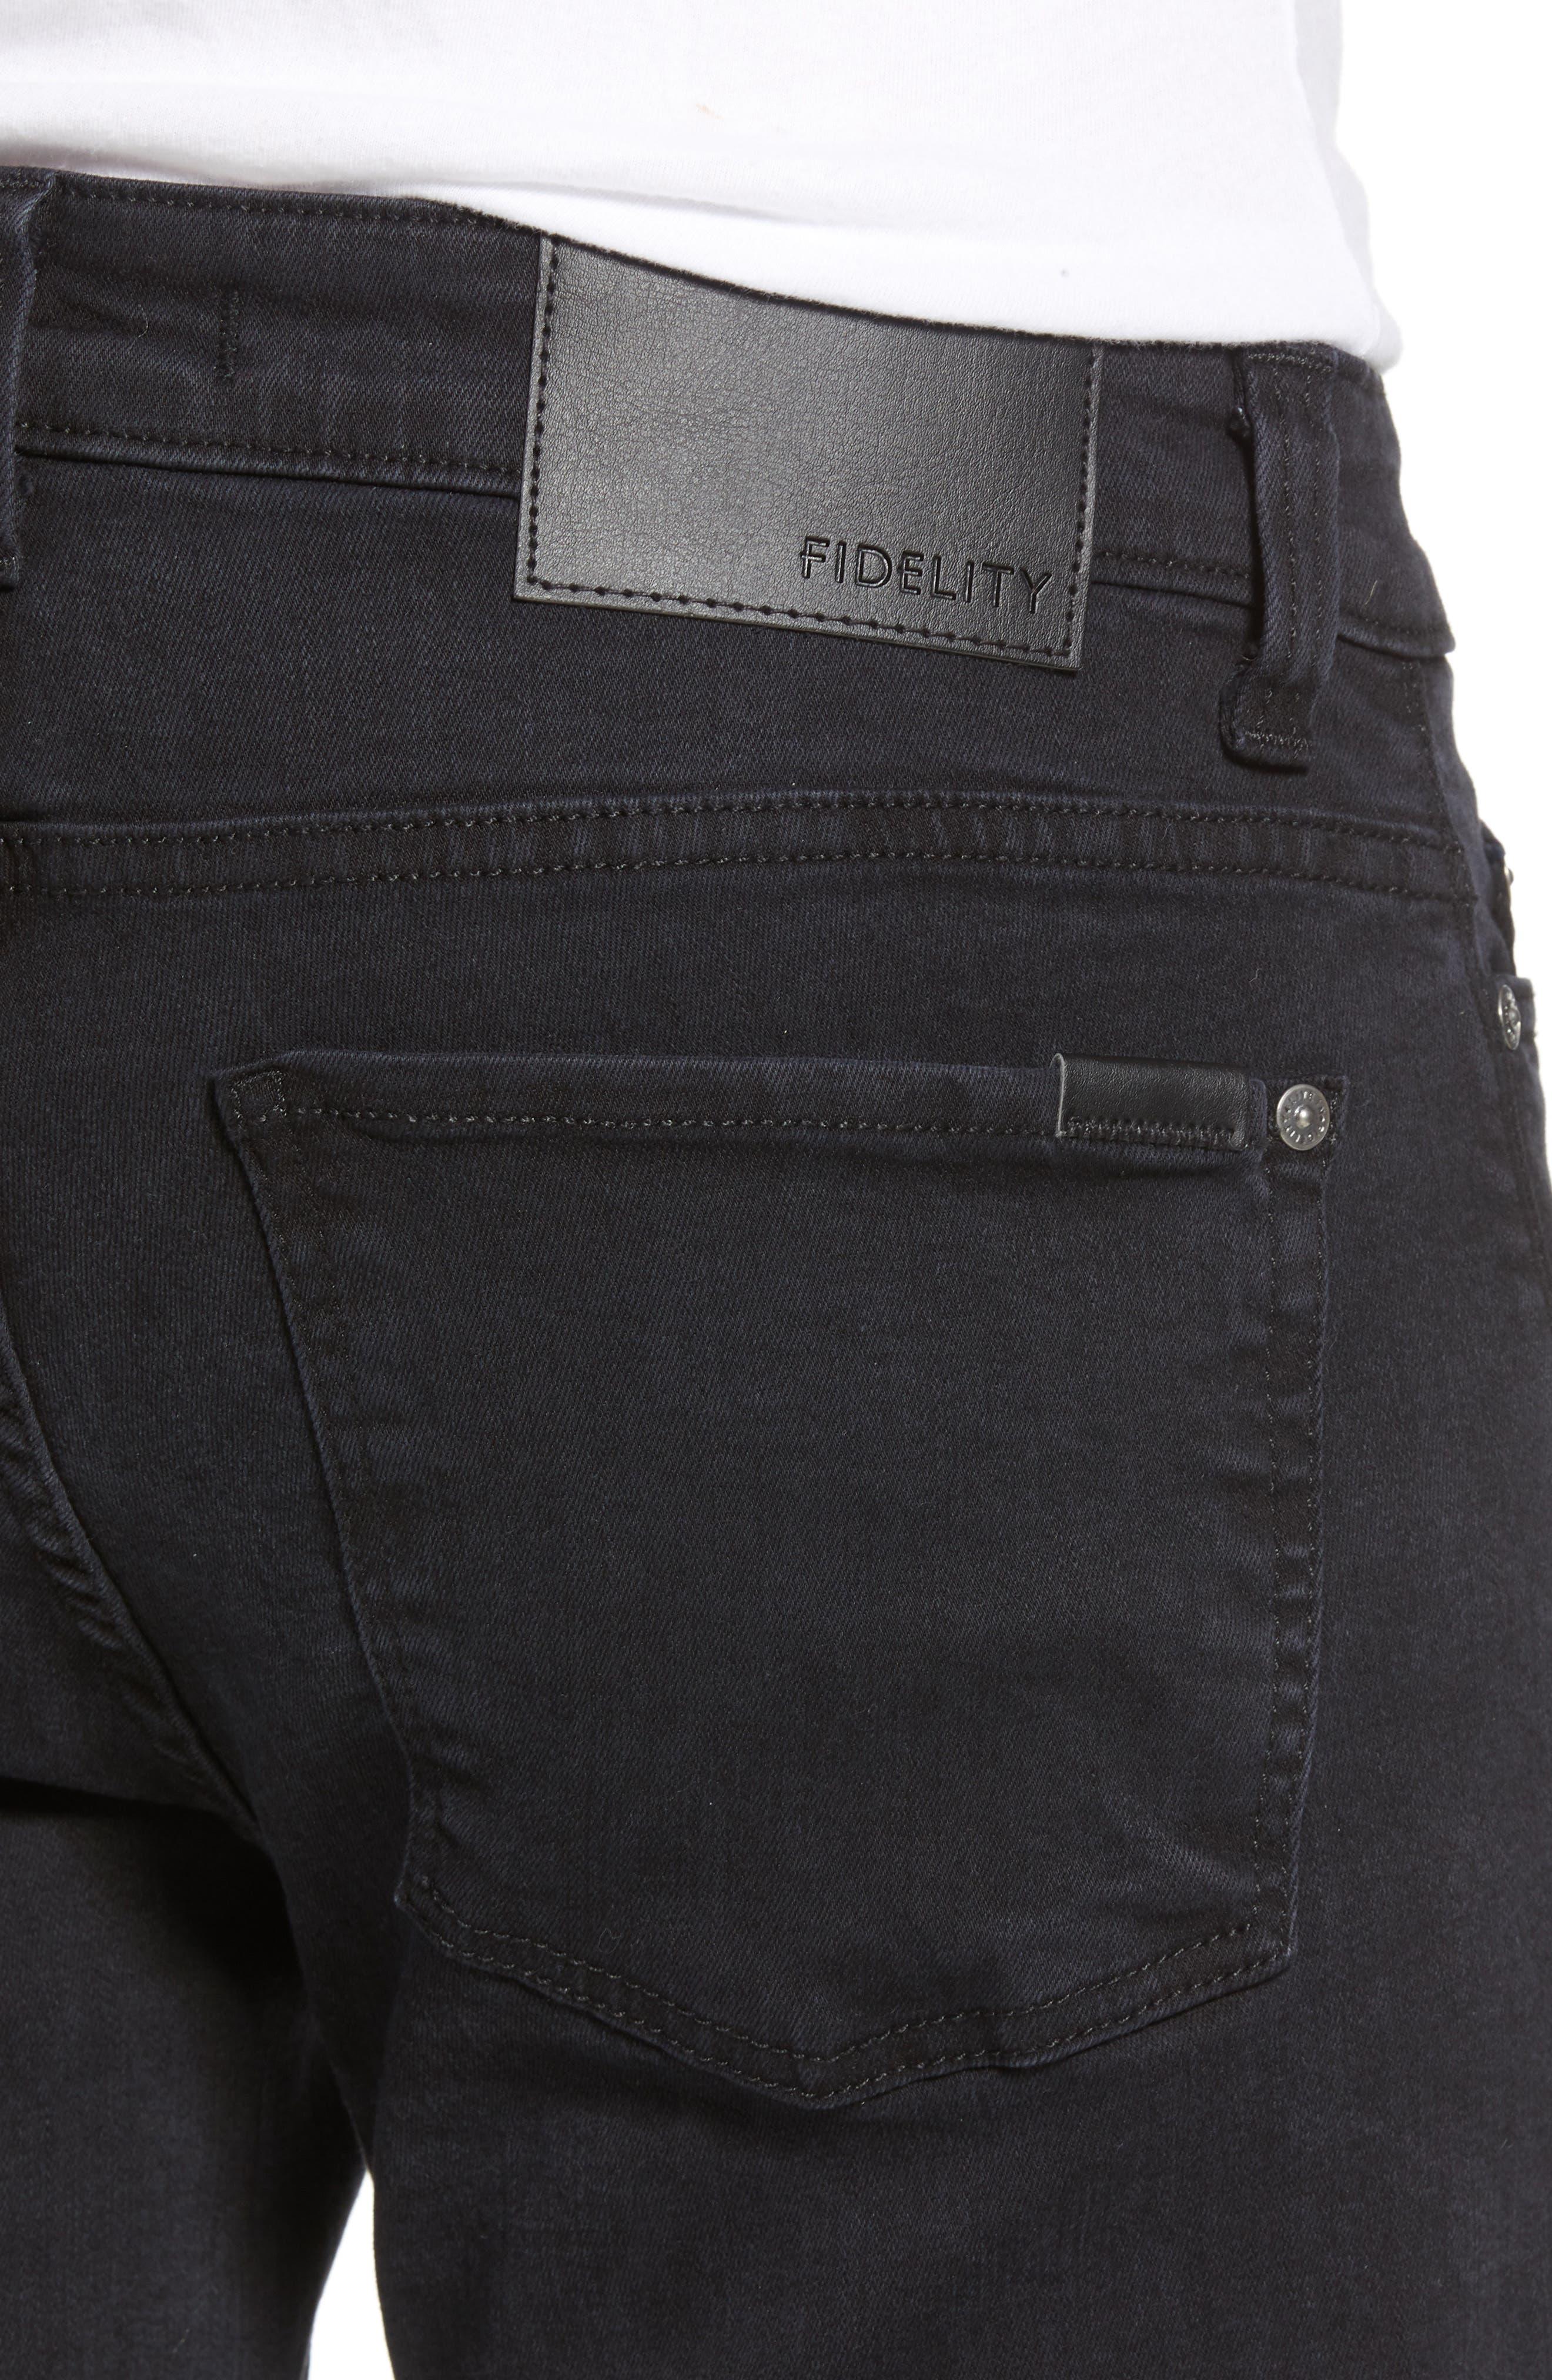 Torino Slim Fit Jeans,                             Alternate thumbnail 4, color,